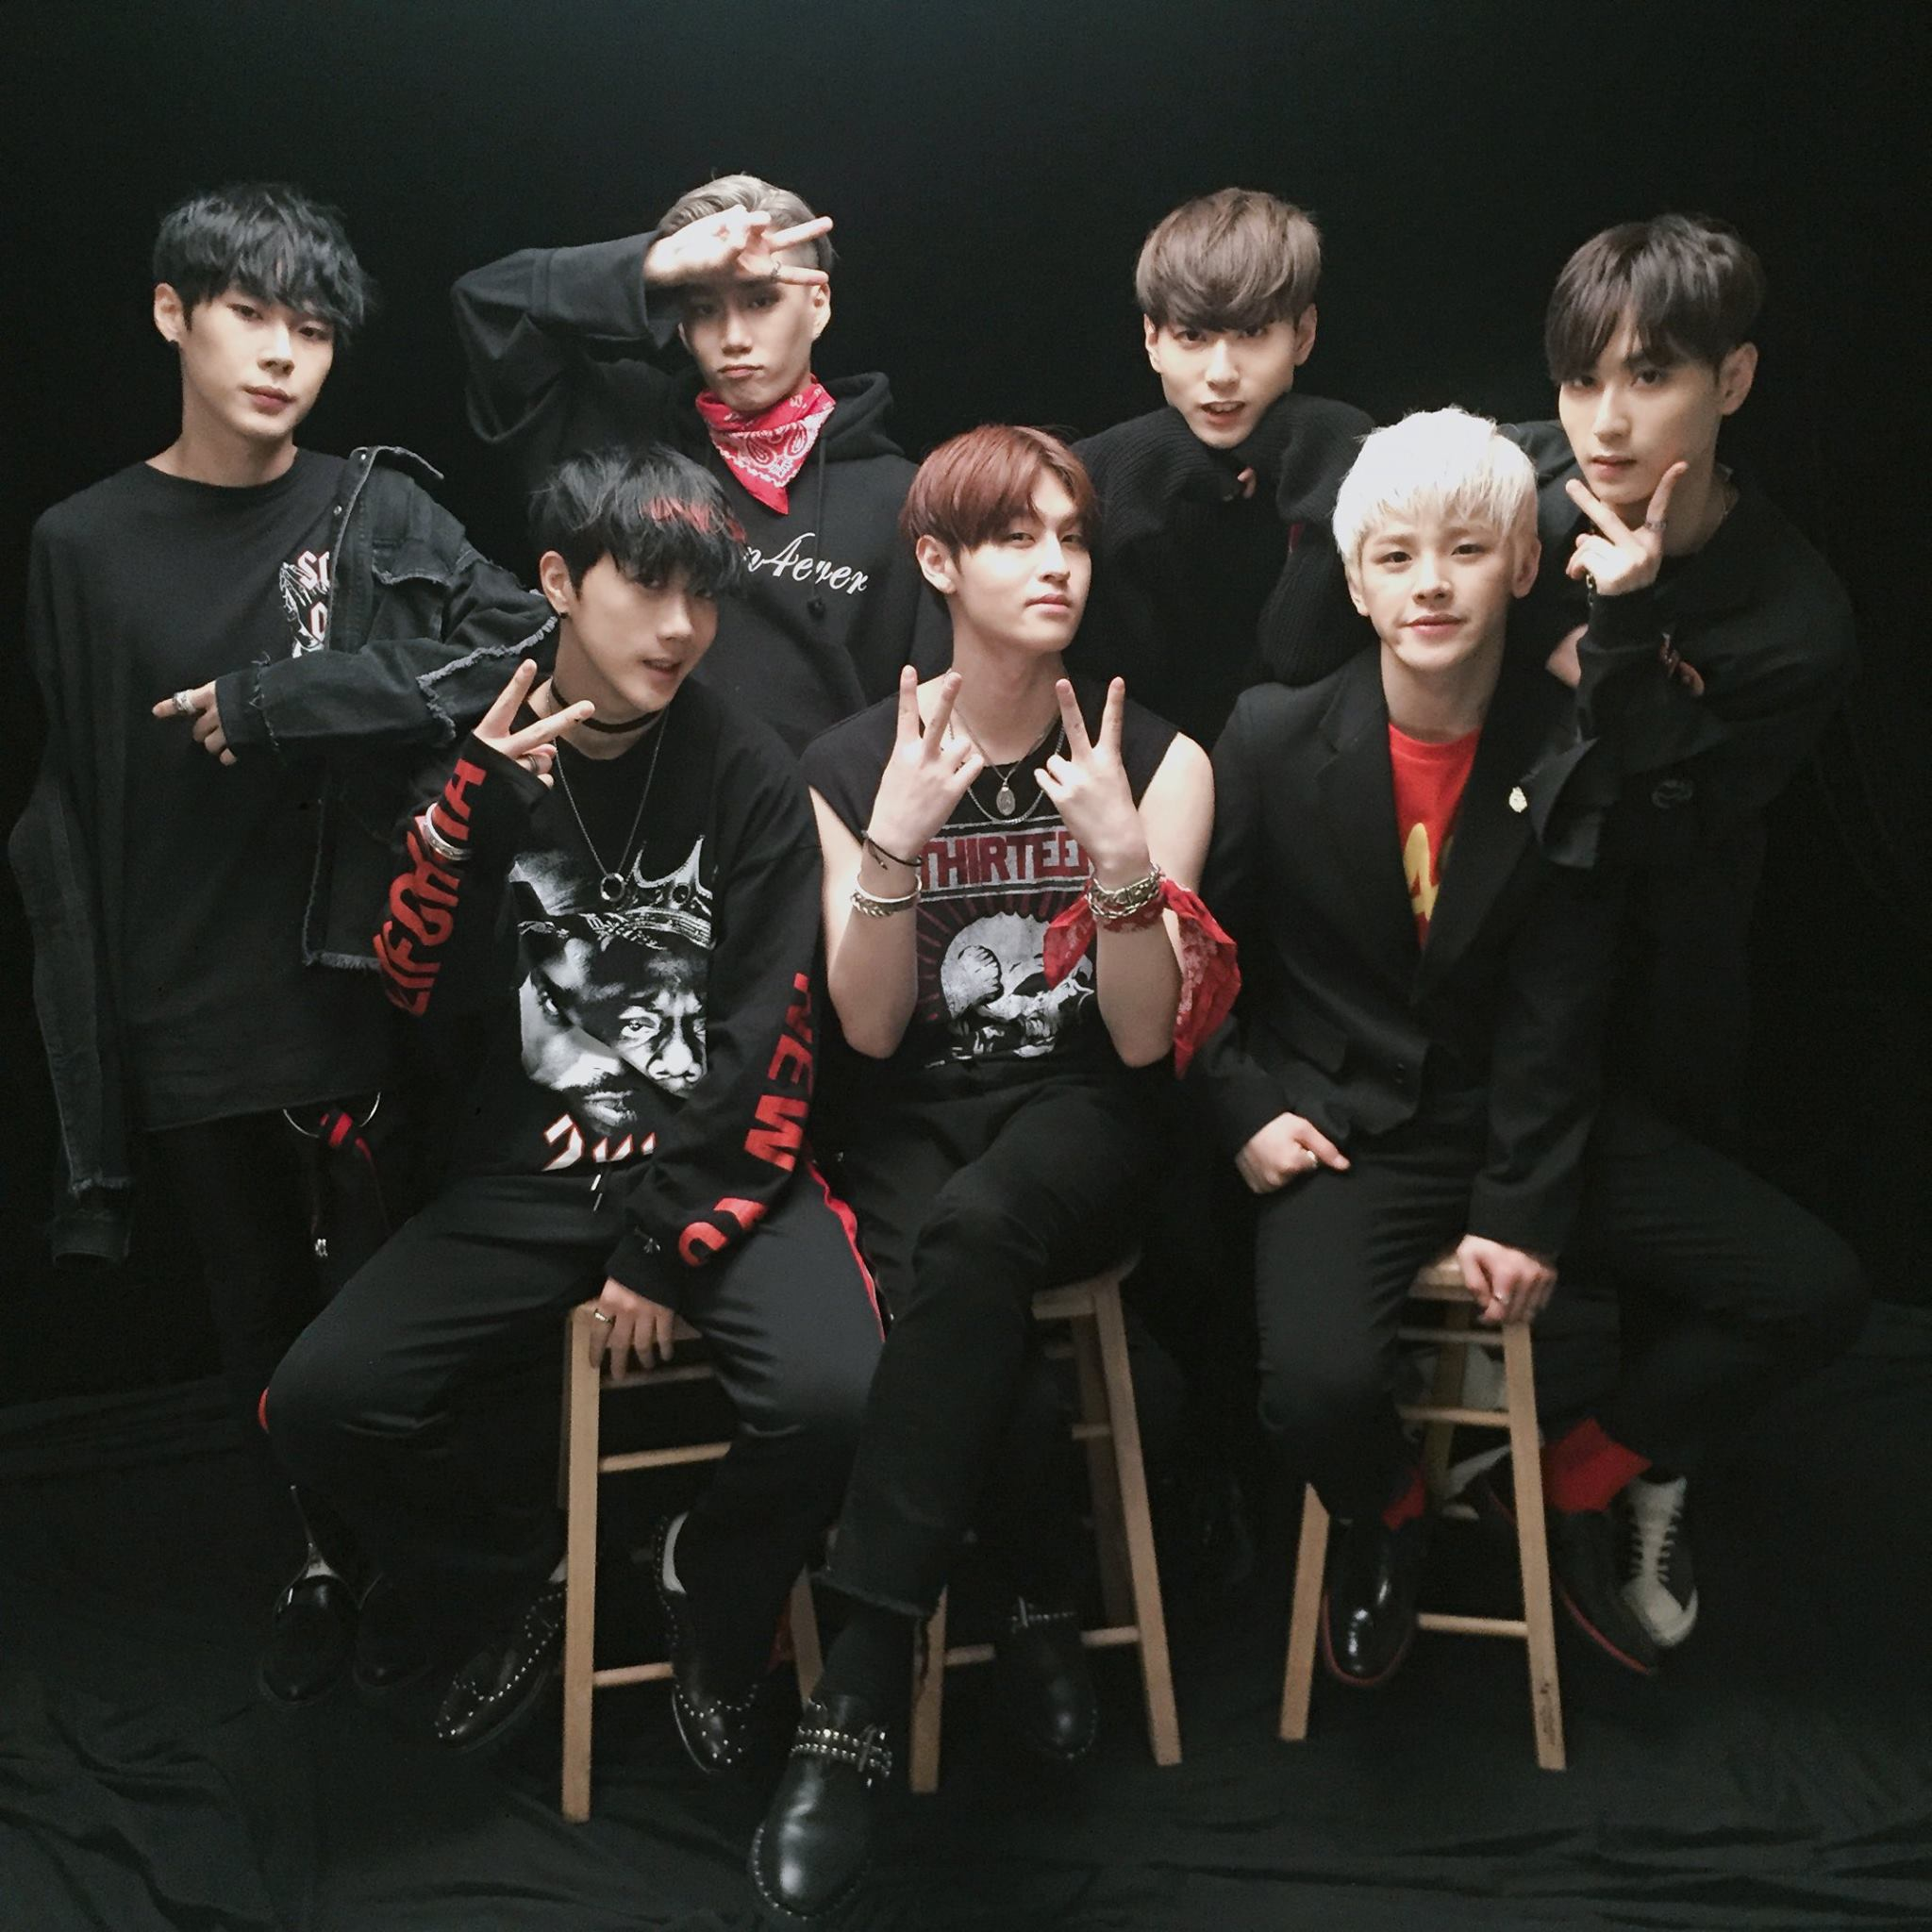 mvp, kpop mvp, mvp profile, mvp members, mvp debut, kpop mvp debut, kpop mvp 2017, kpop mvp members, mvp manifest